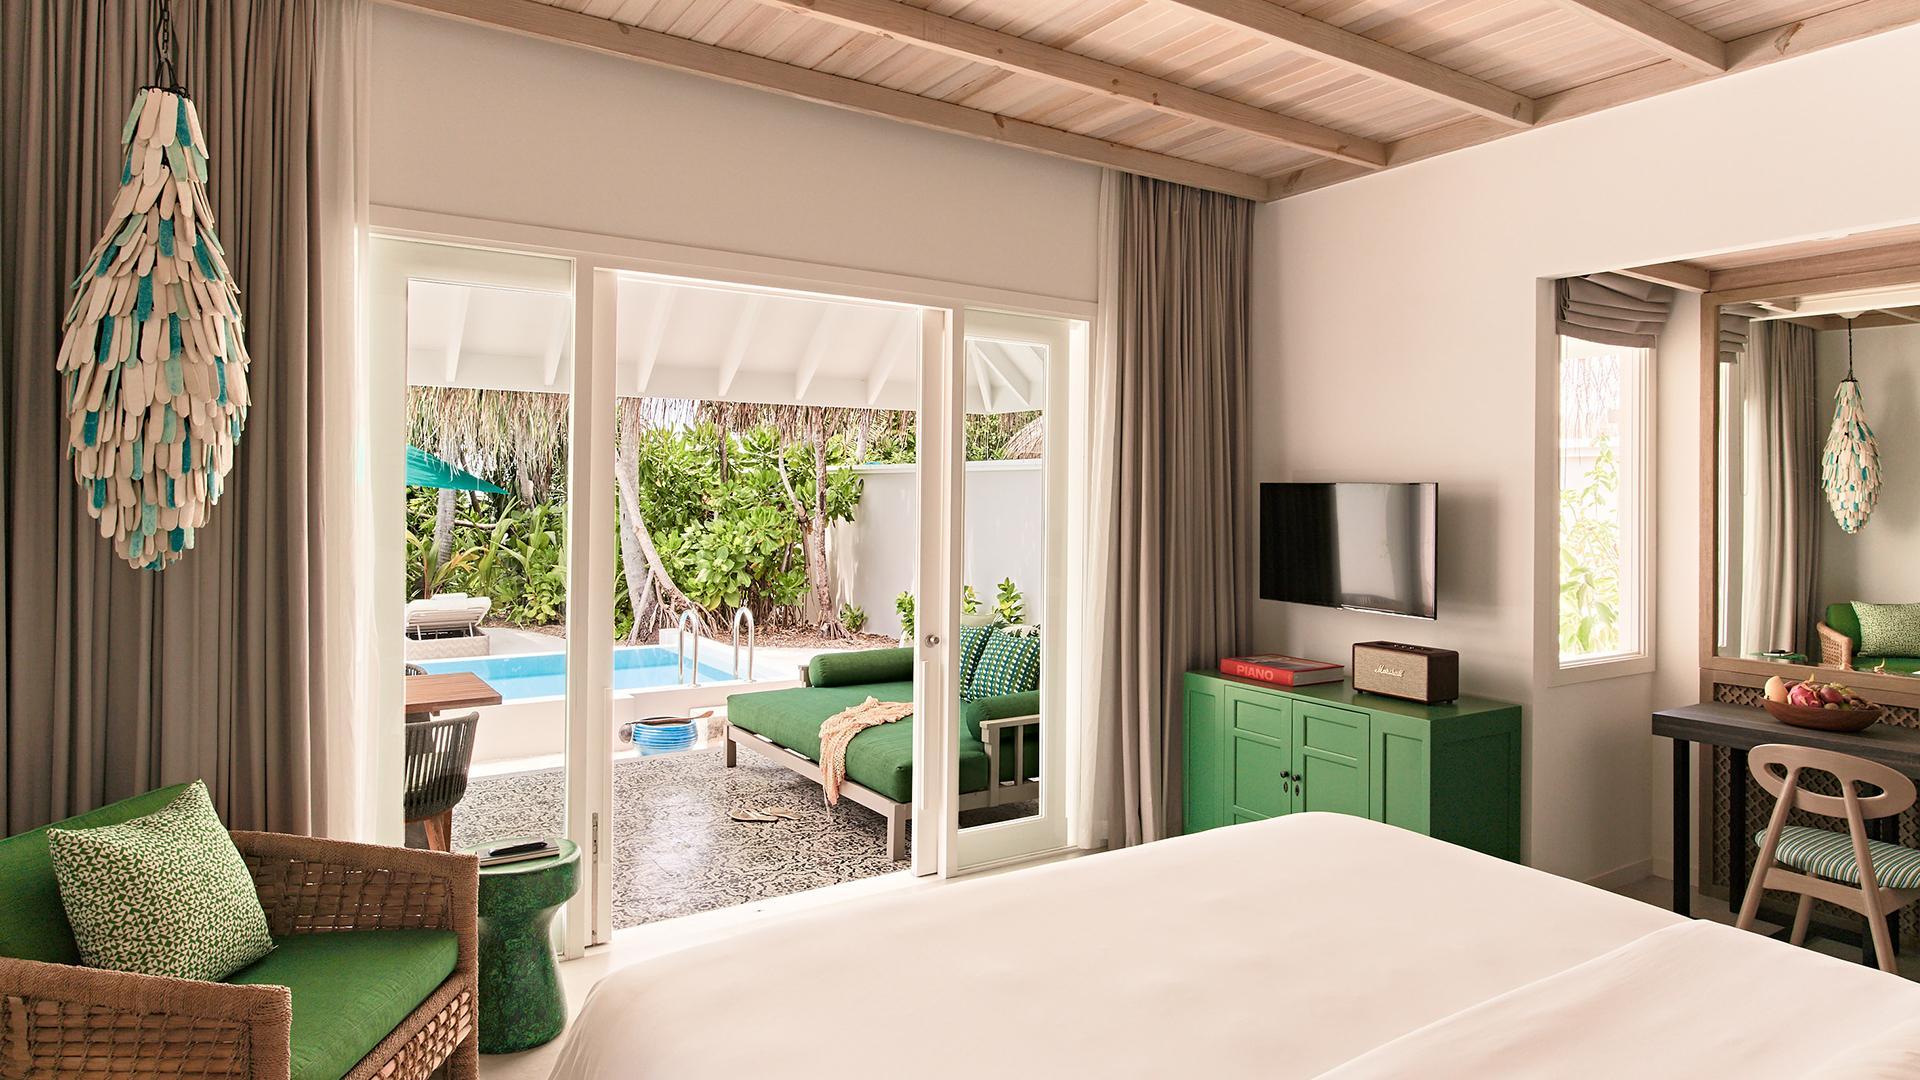 Private Pool Villa image 1 at Seaside Finolhu Maldives by Baa Atoll, North Province, Maldives